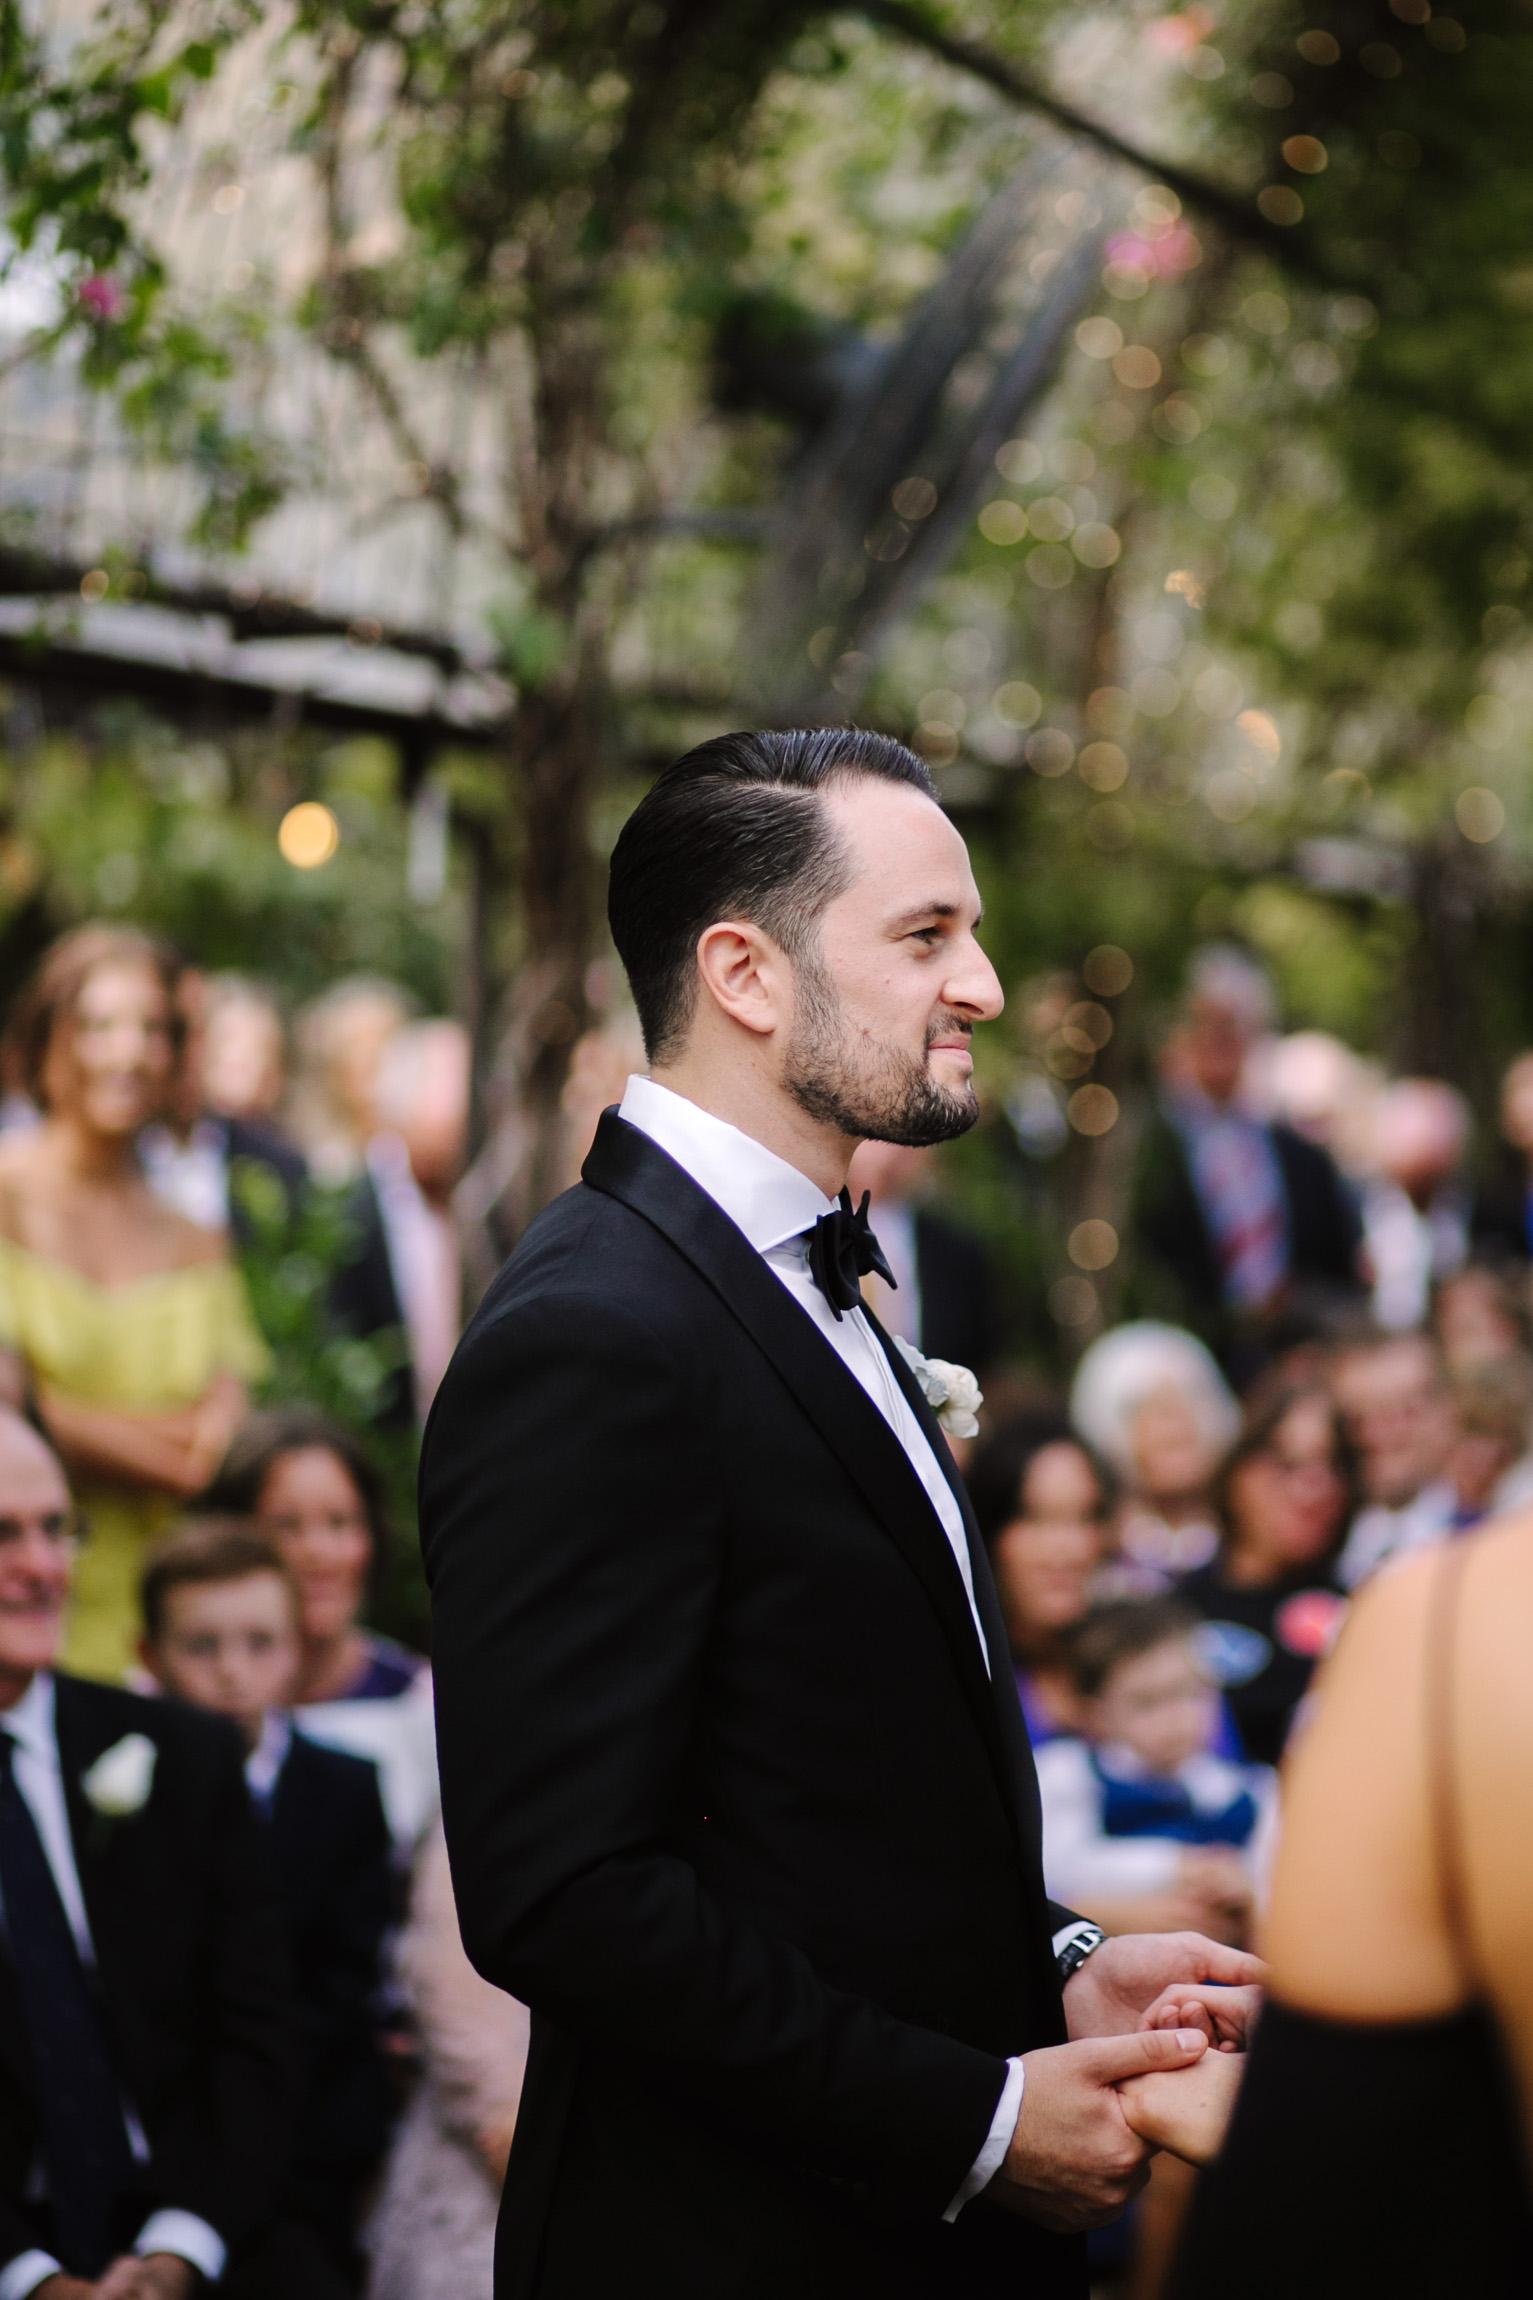 180223_justinaaron_wedding_charlotte_david_h-118.jpg